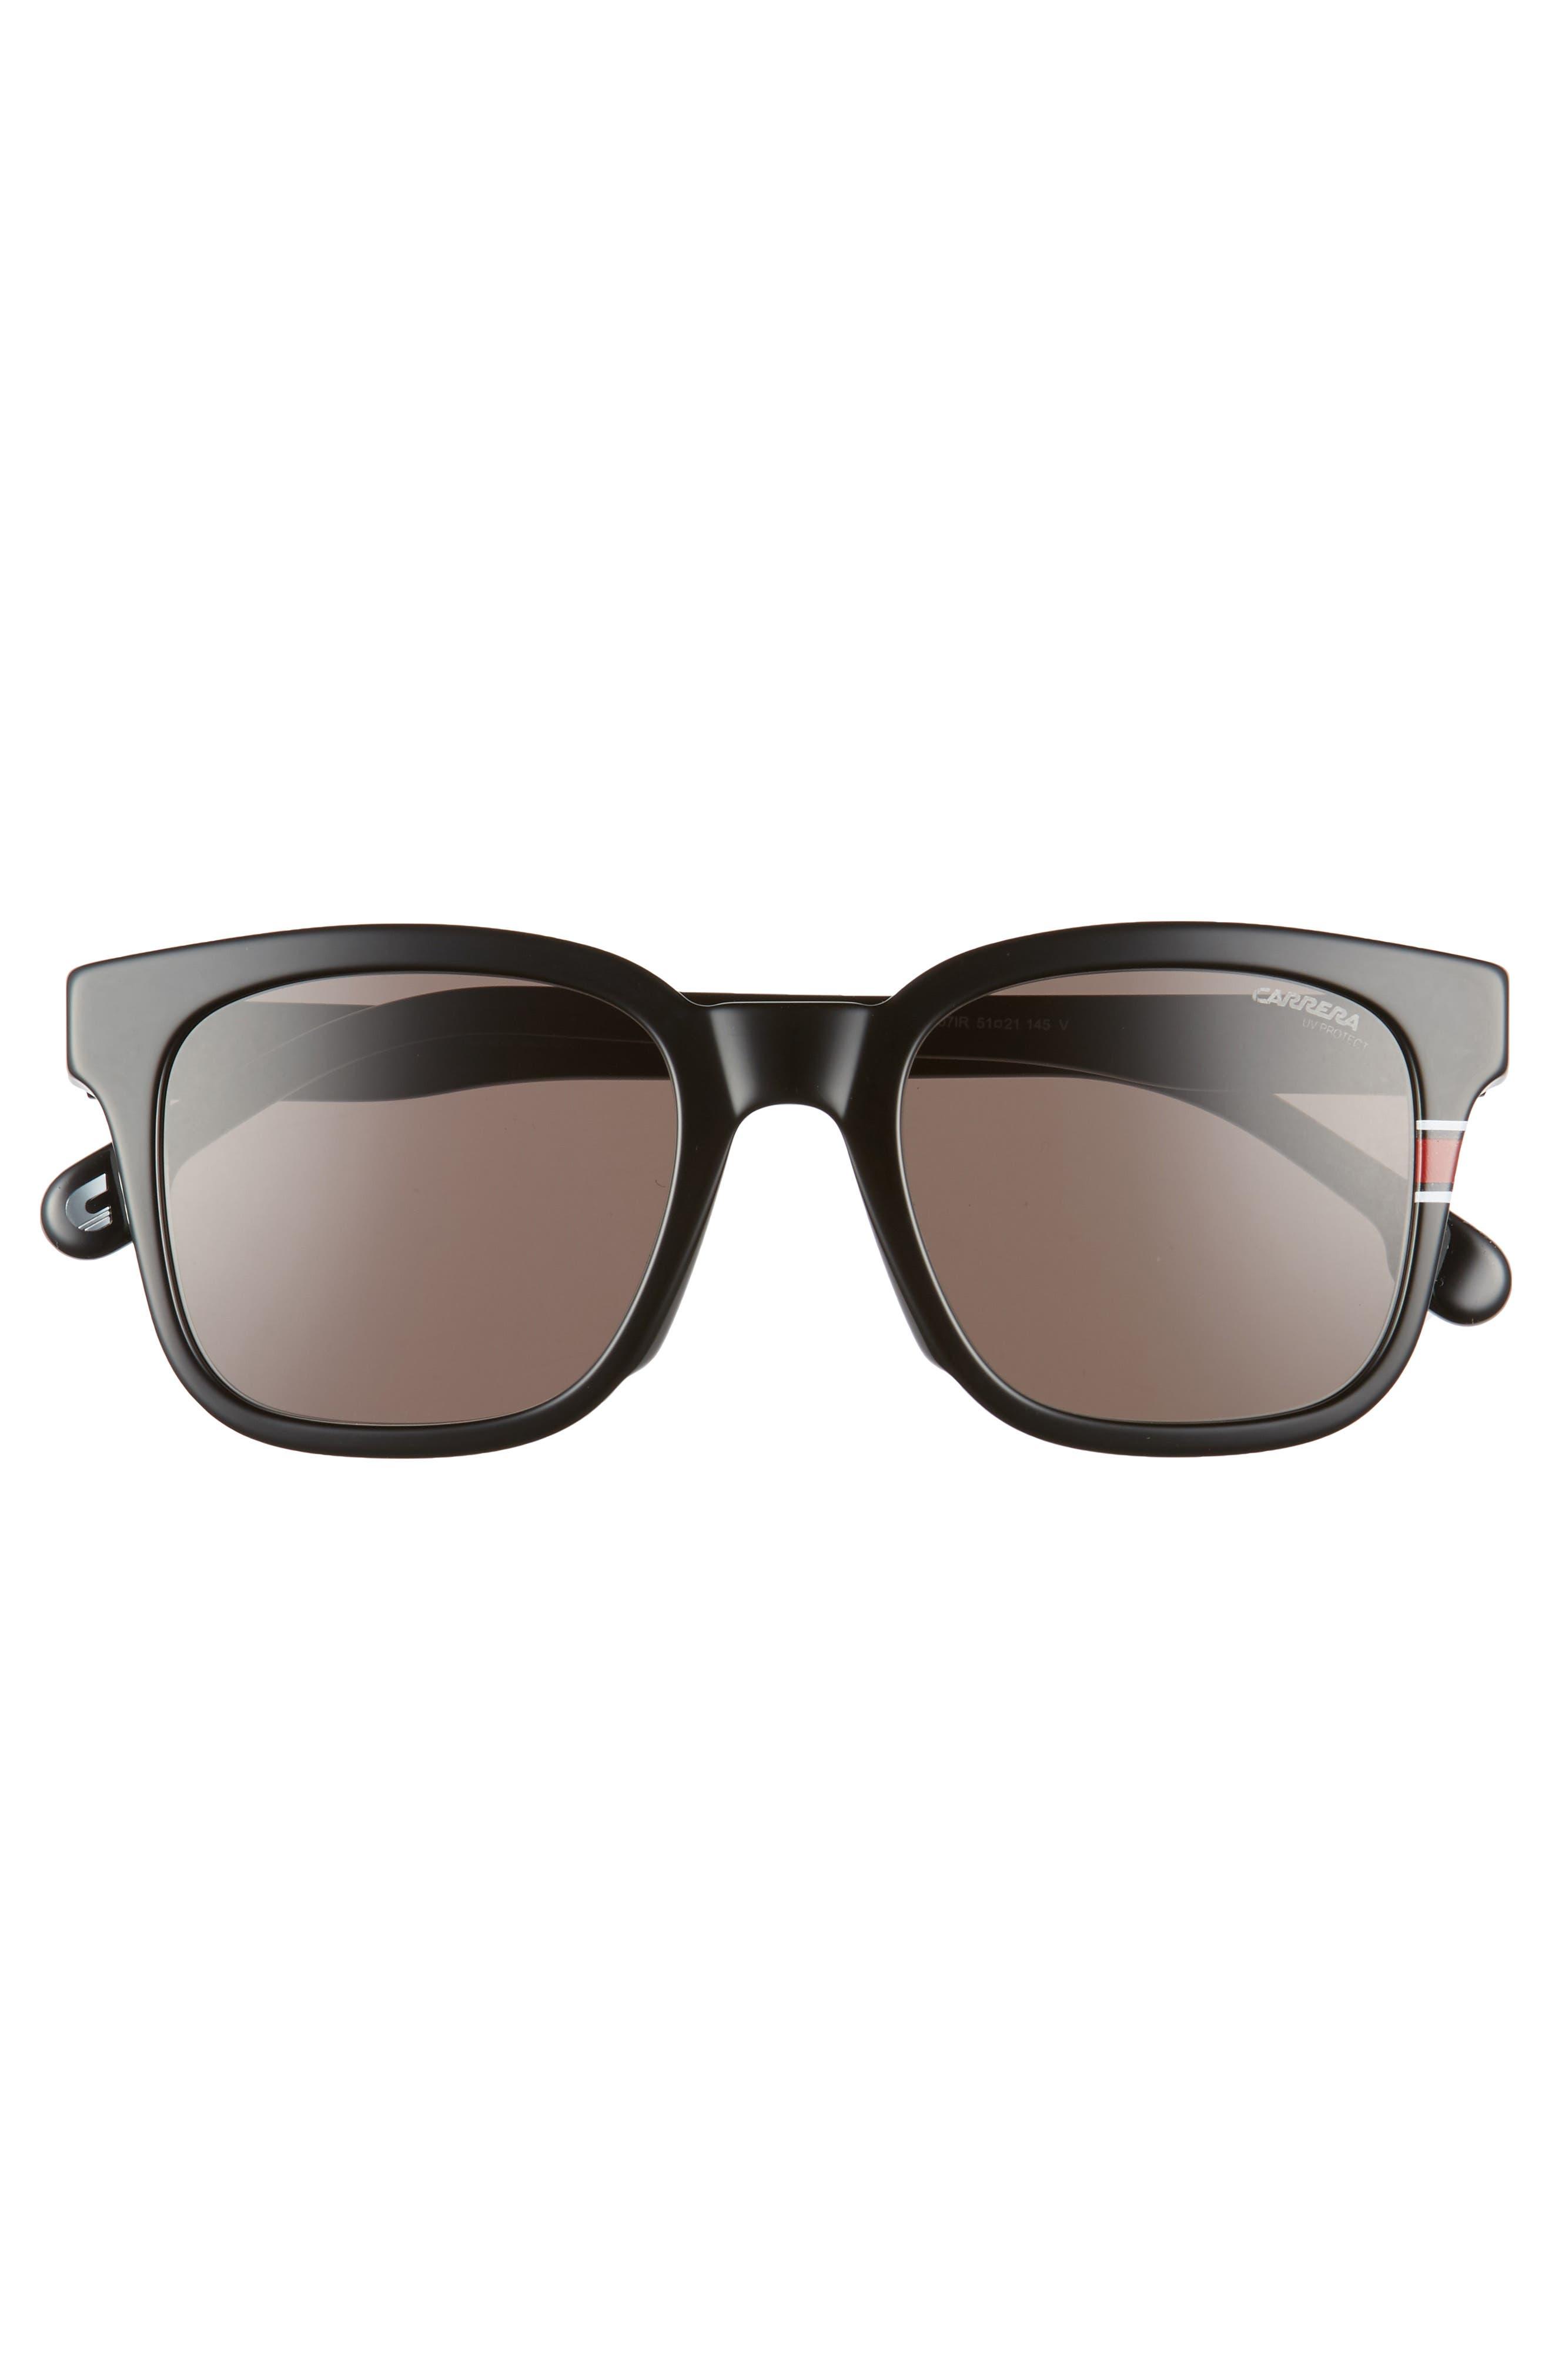 51mm Polarized Sunglasses,                             Alternate thumbnail 2, color,                             002